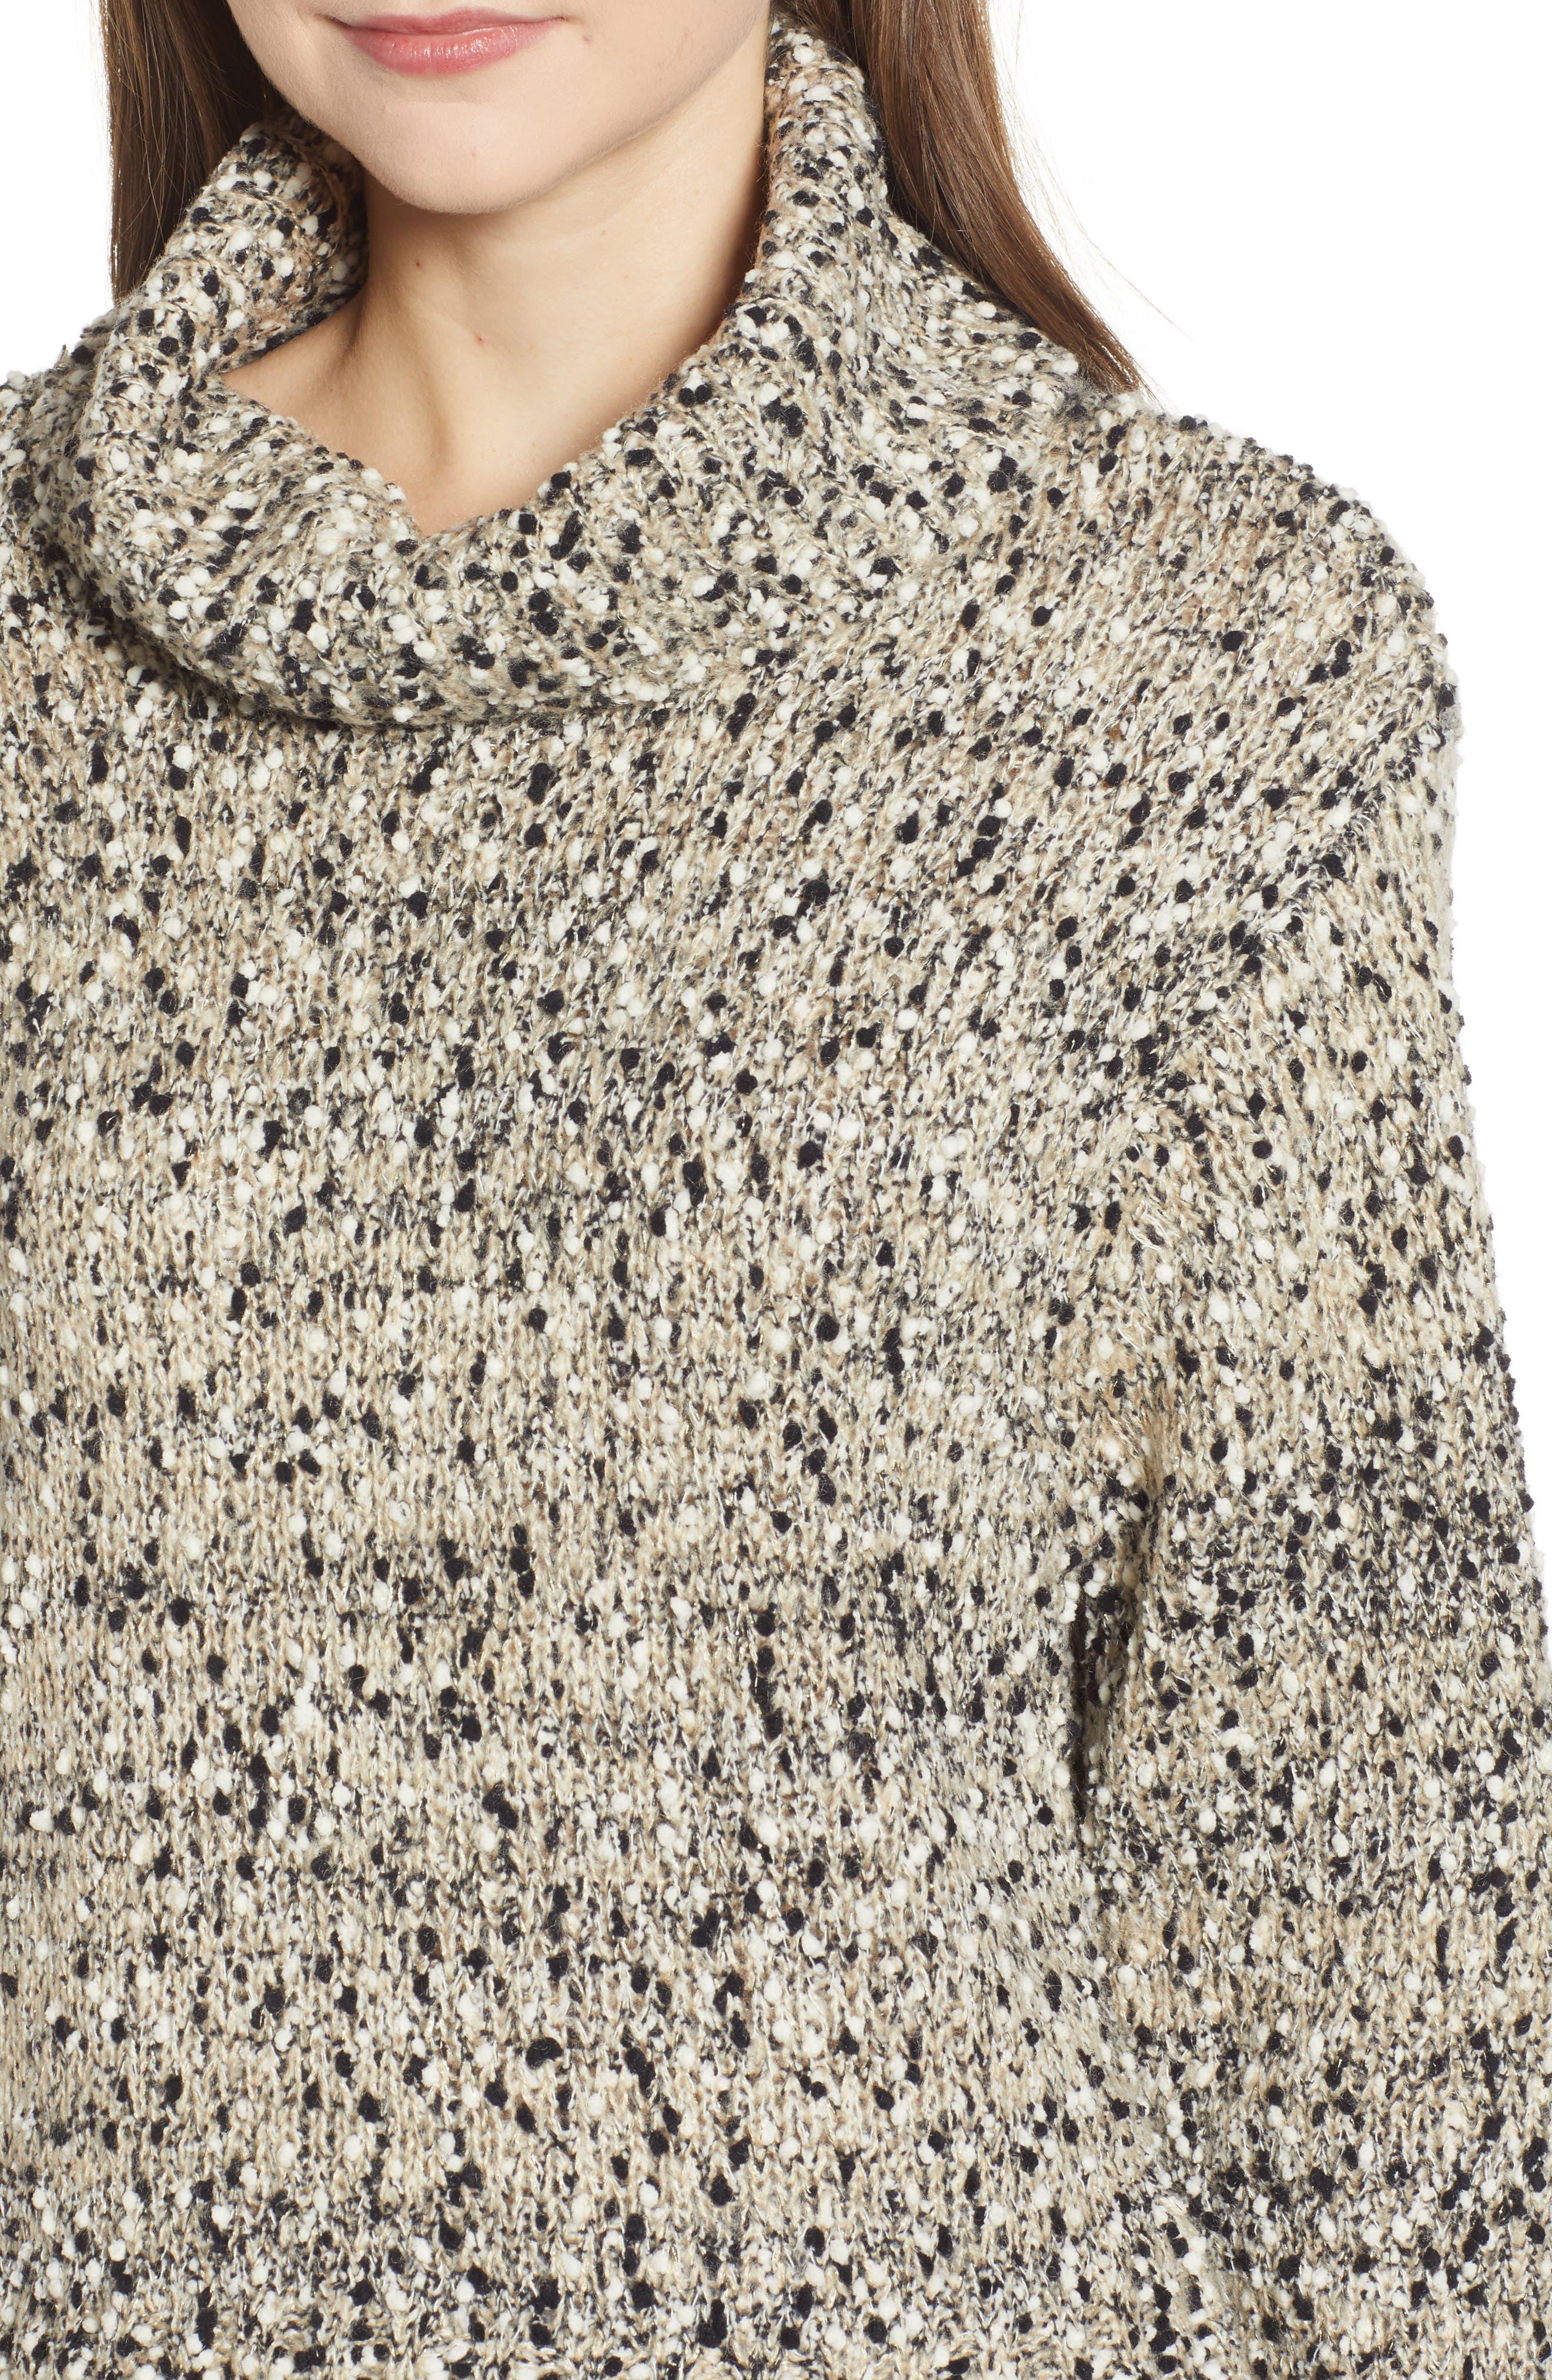 Metallic Slub Turtleneck Sweater,                             Alternate thumbnail 4, color,                             OATMEAL MULTI